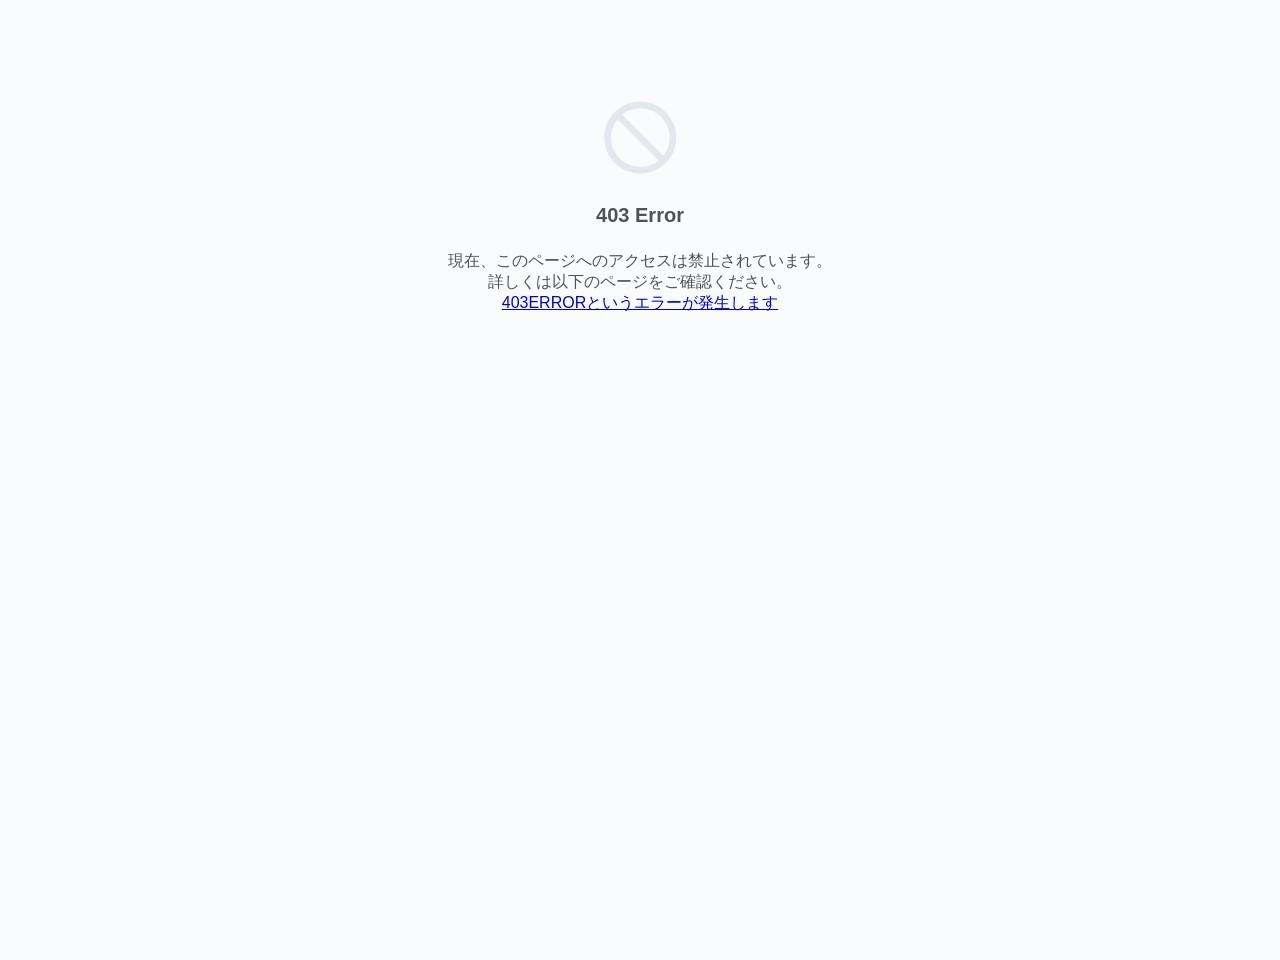 Ayaピアノ教室(千葉パール教室)のサムネイル